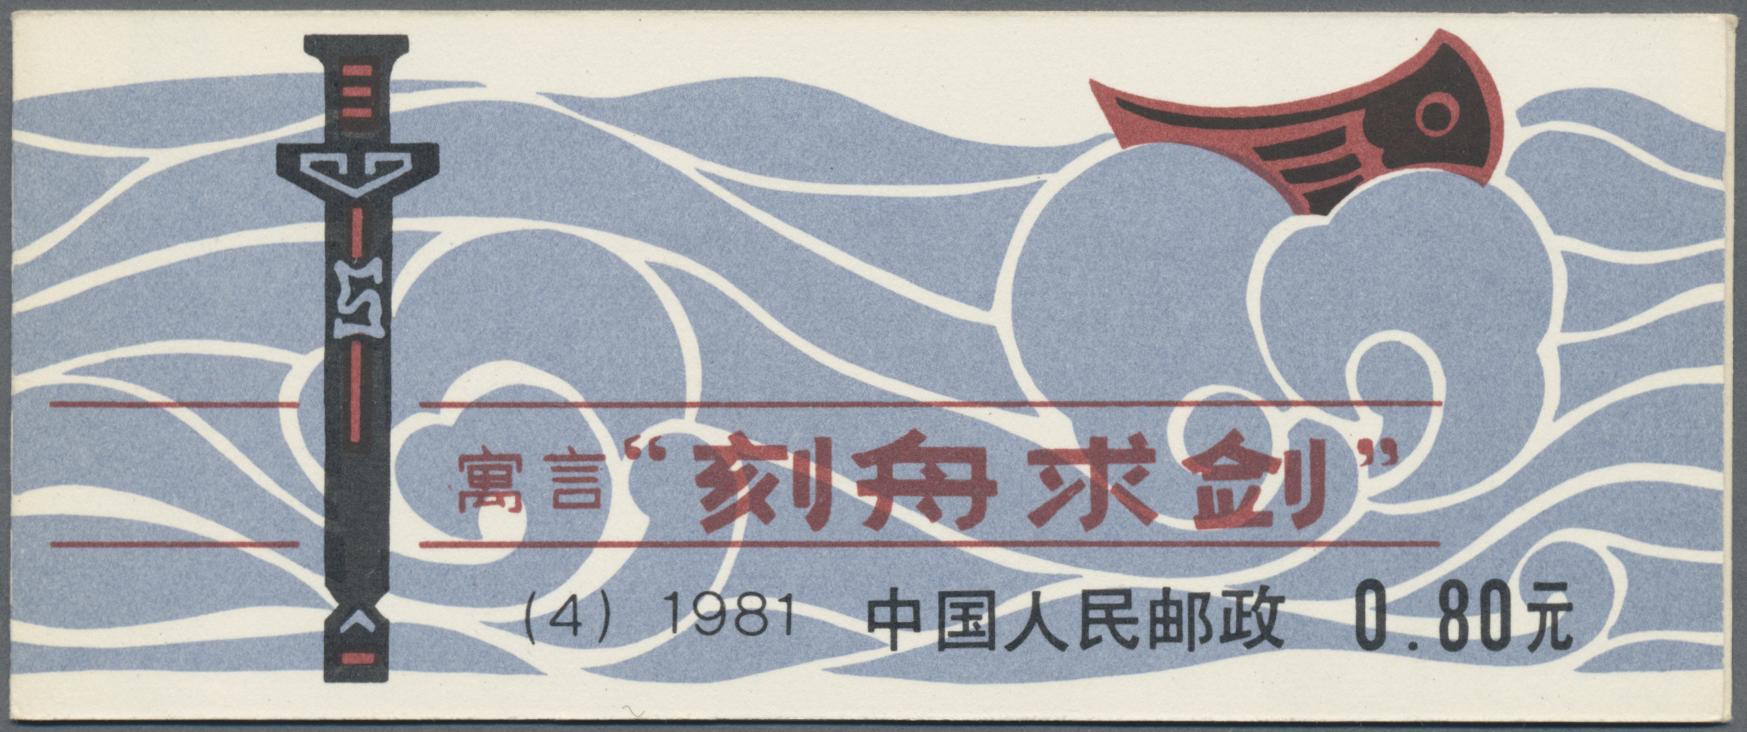 Lot 09335 - China - Volksrepublik  -  Auktionshaus Christoph Gärtner GmbH & Co. KG 51th Auction - Day 4